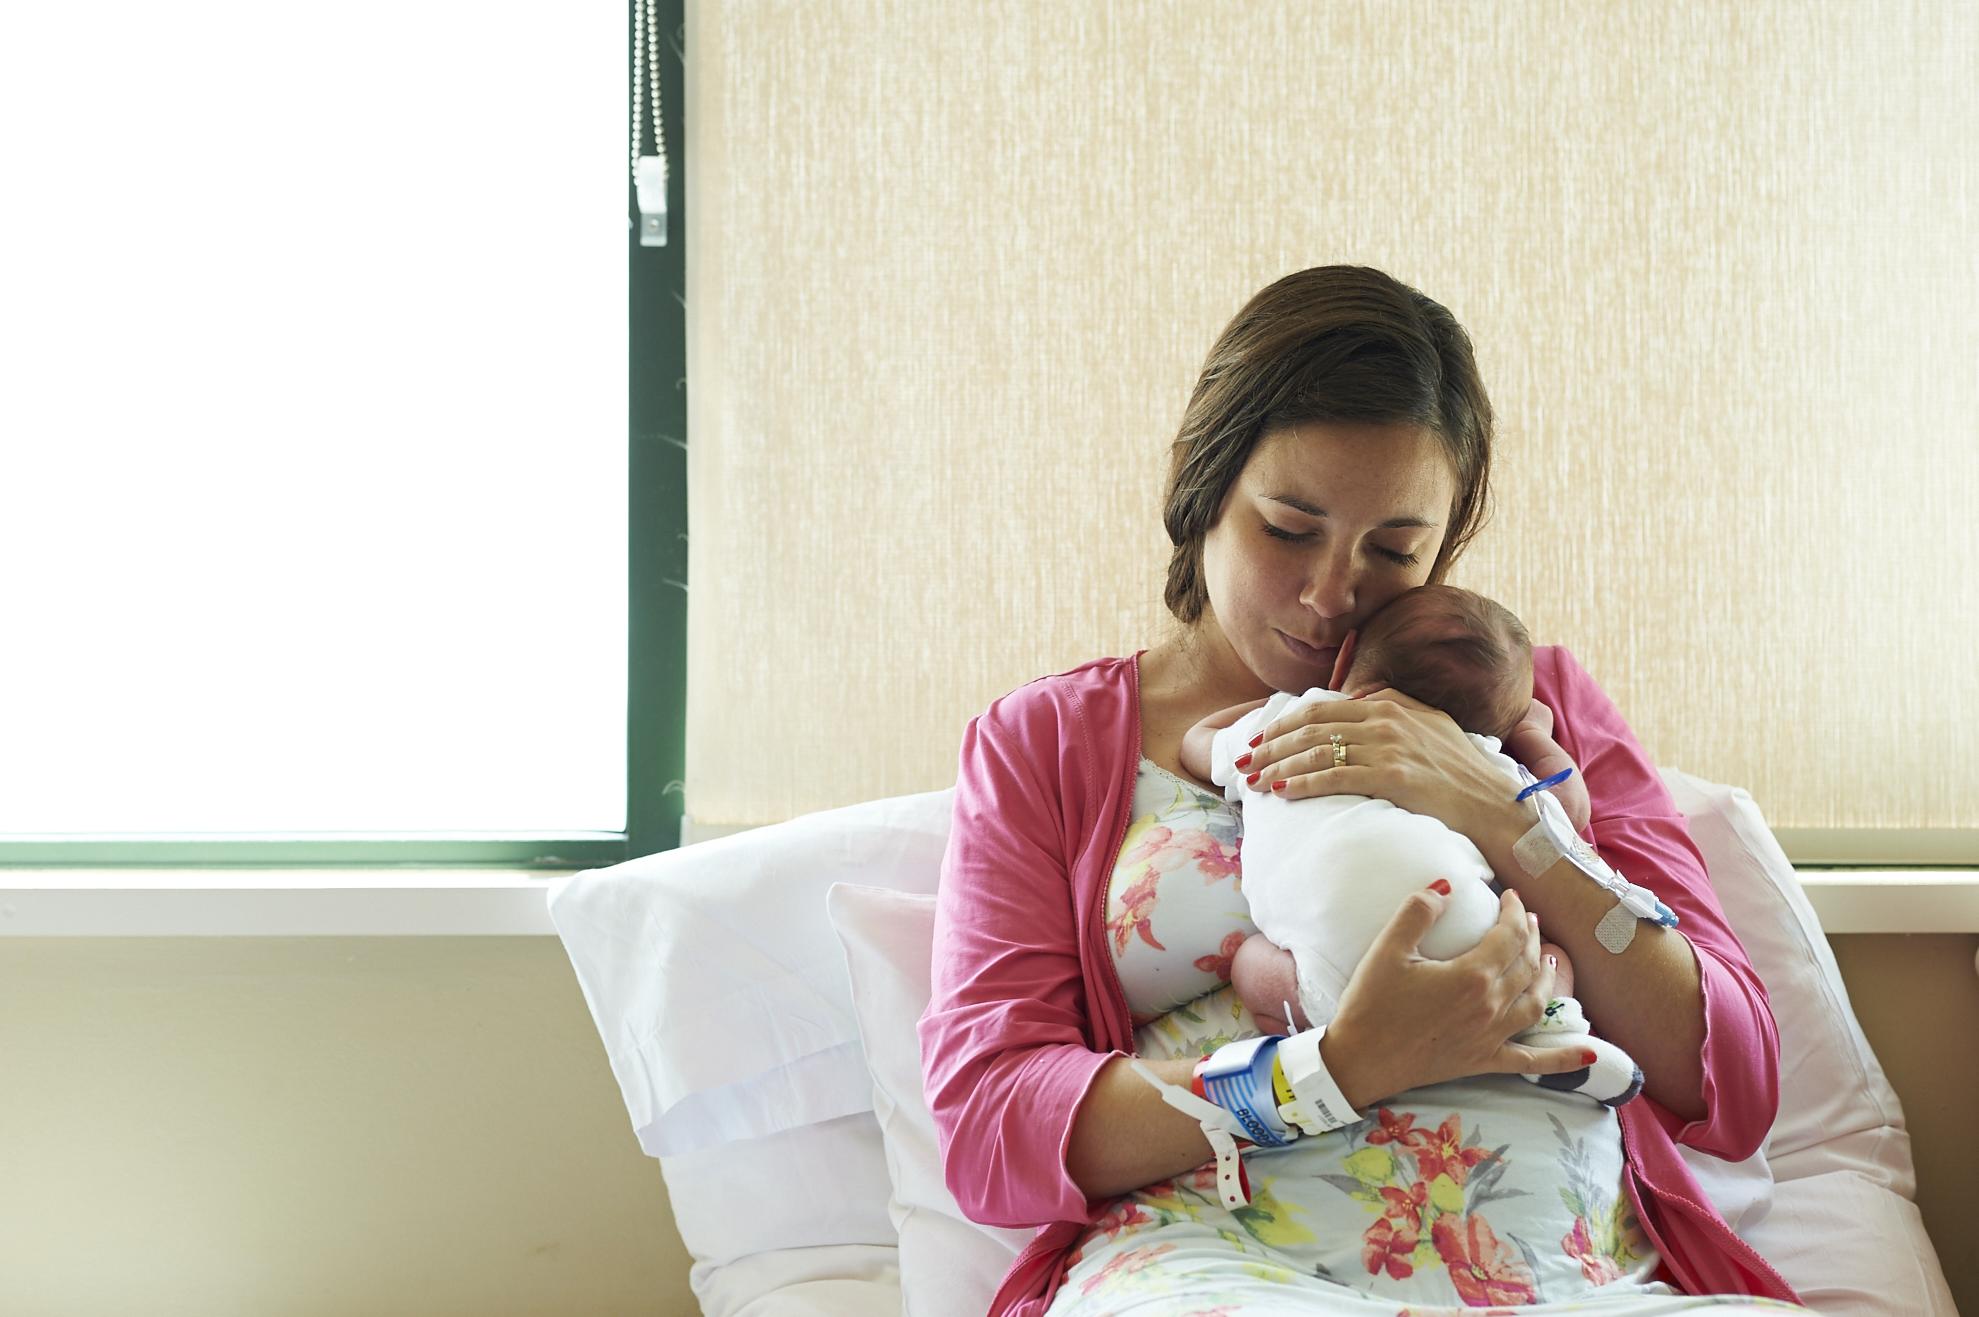 birth, itstheeveryday, photography, lifestyle, motherhood, gift, baby, newborn, hospital, rainbow baby, son